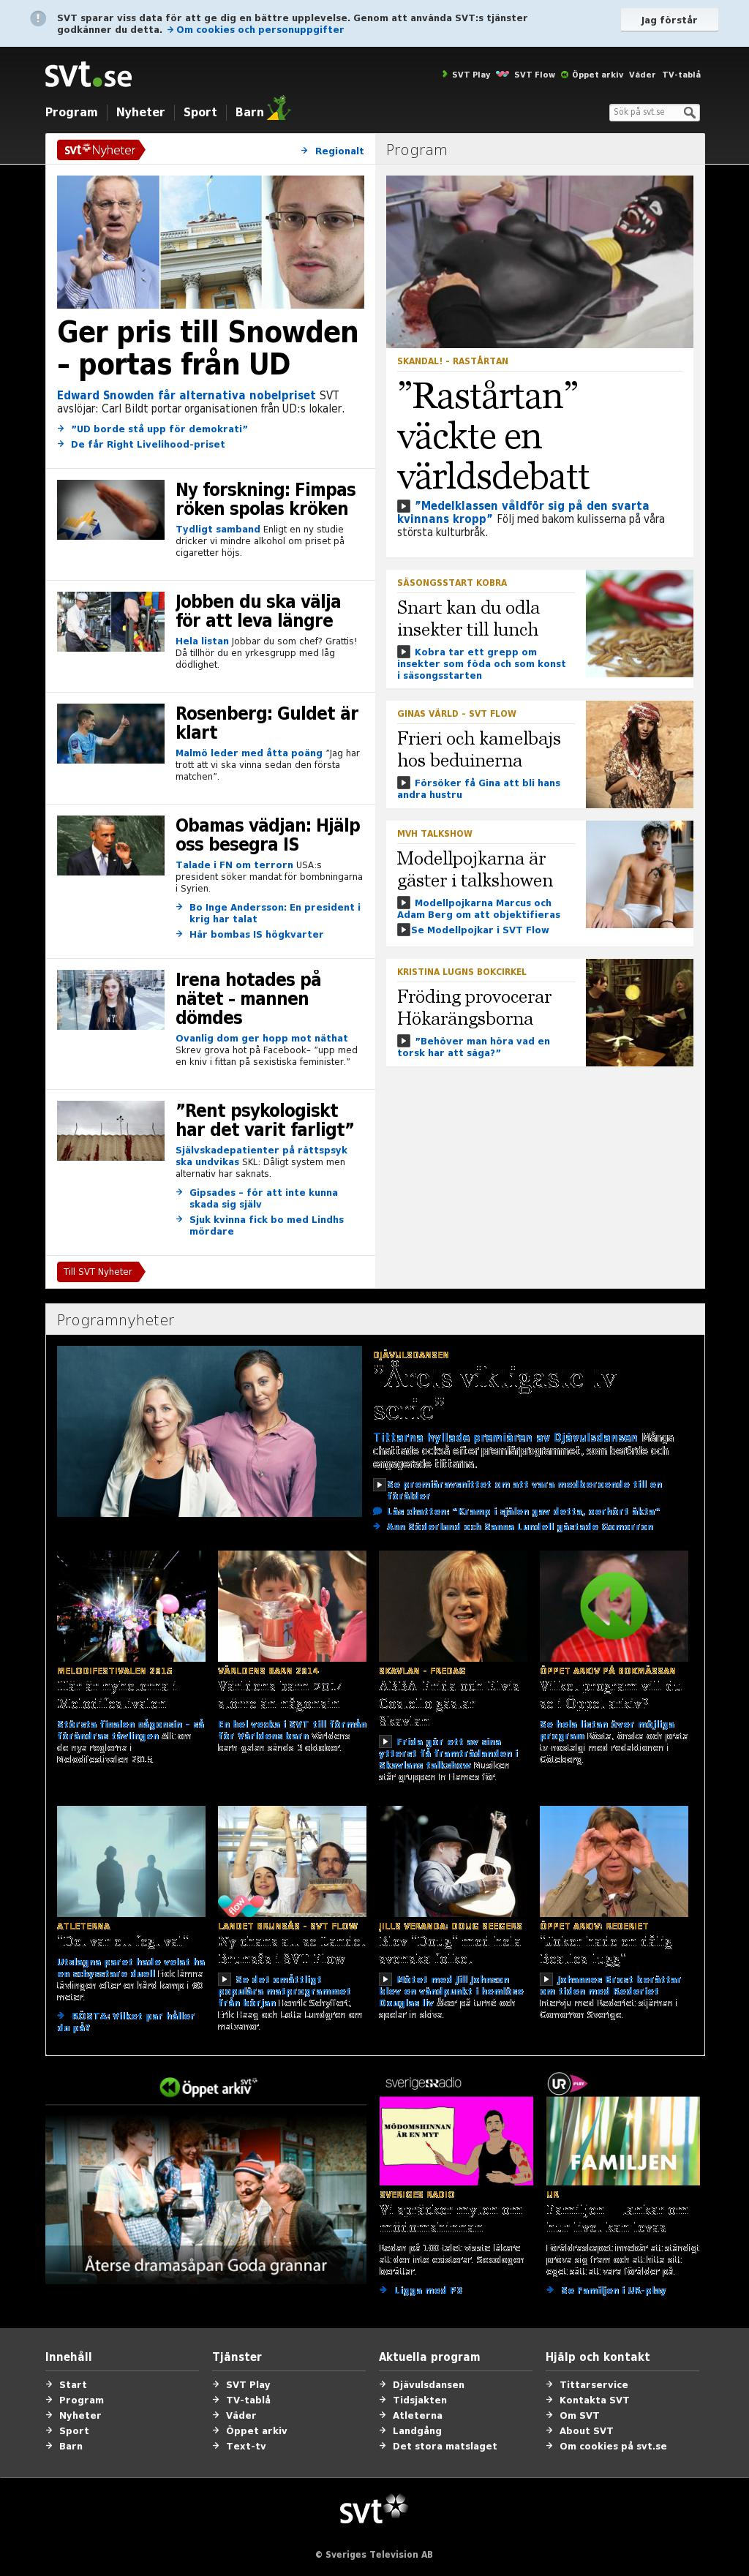 SVT at Wednesday Sept. 24, 2014, 8:16 p.m. UTC